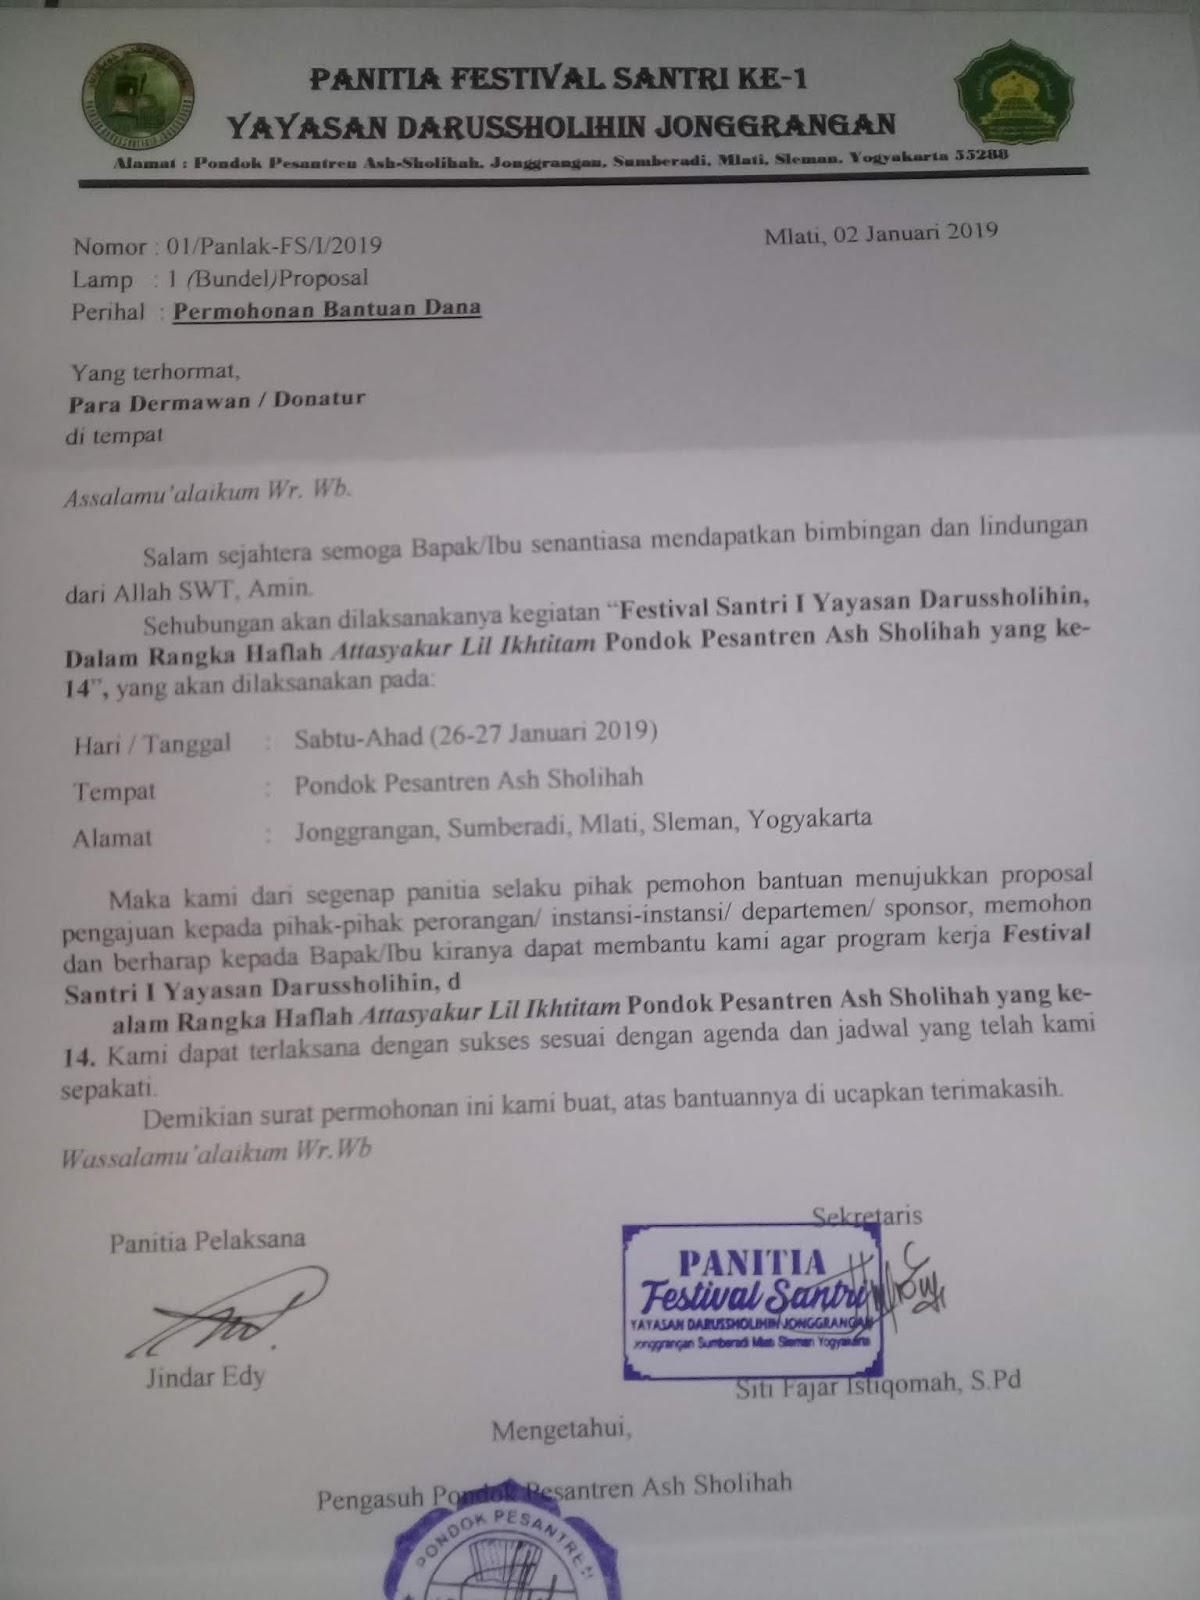 Contoh Surat Permintaan Permohonan Bantuan Dana Proposal